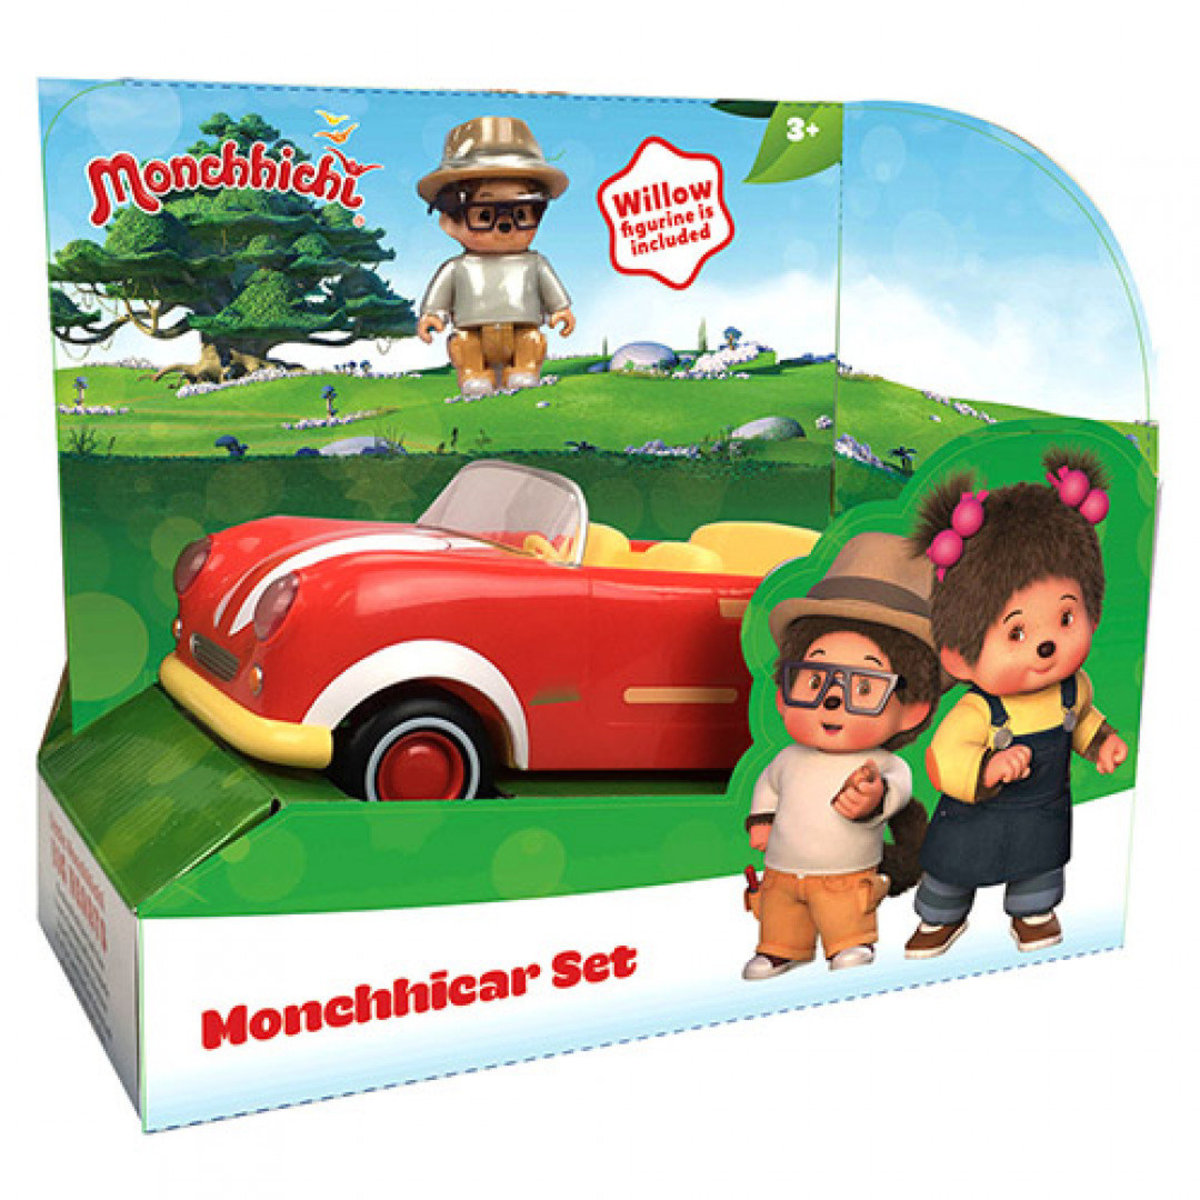 Monchhichi-Vehicle Free Wheel